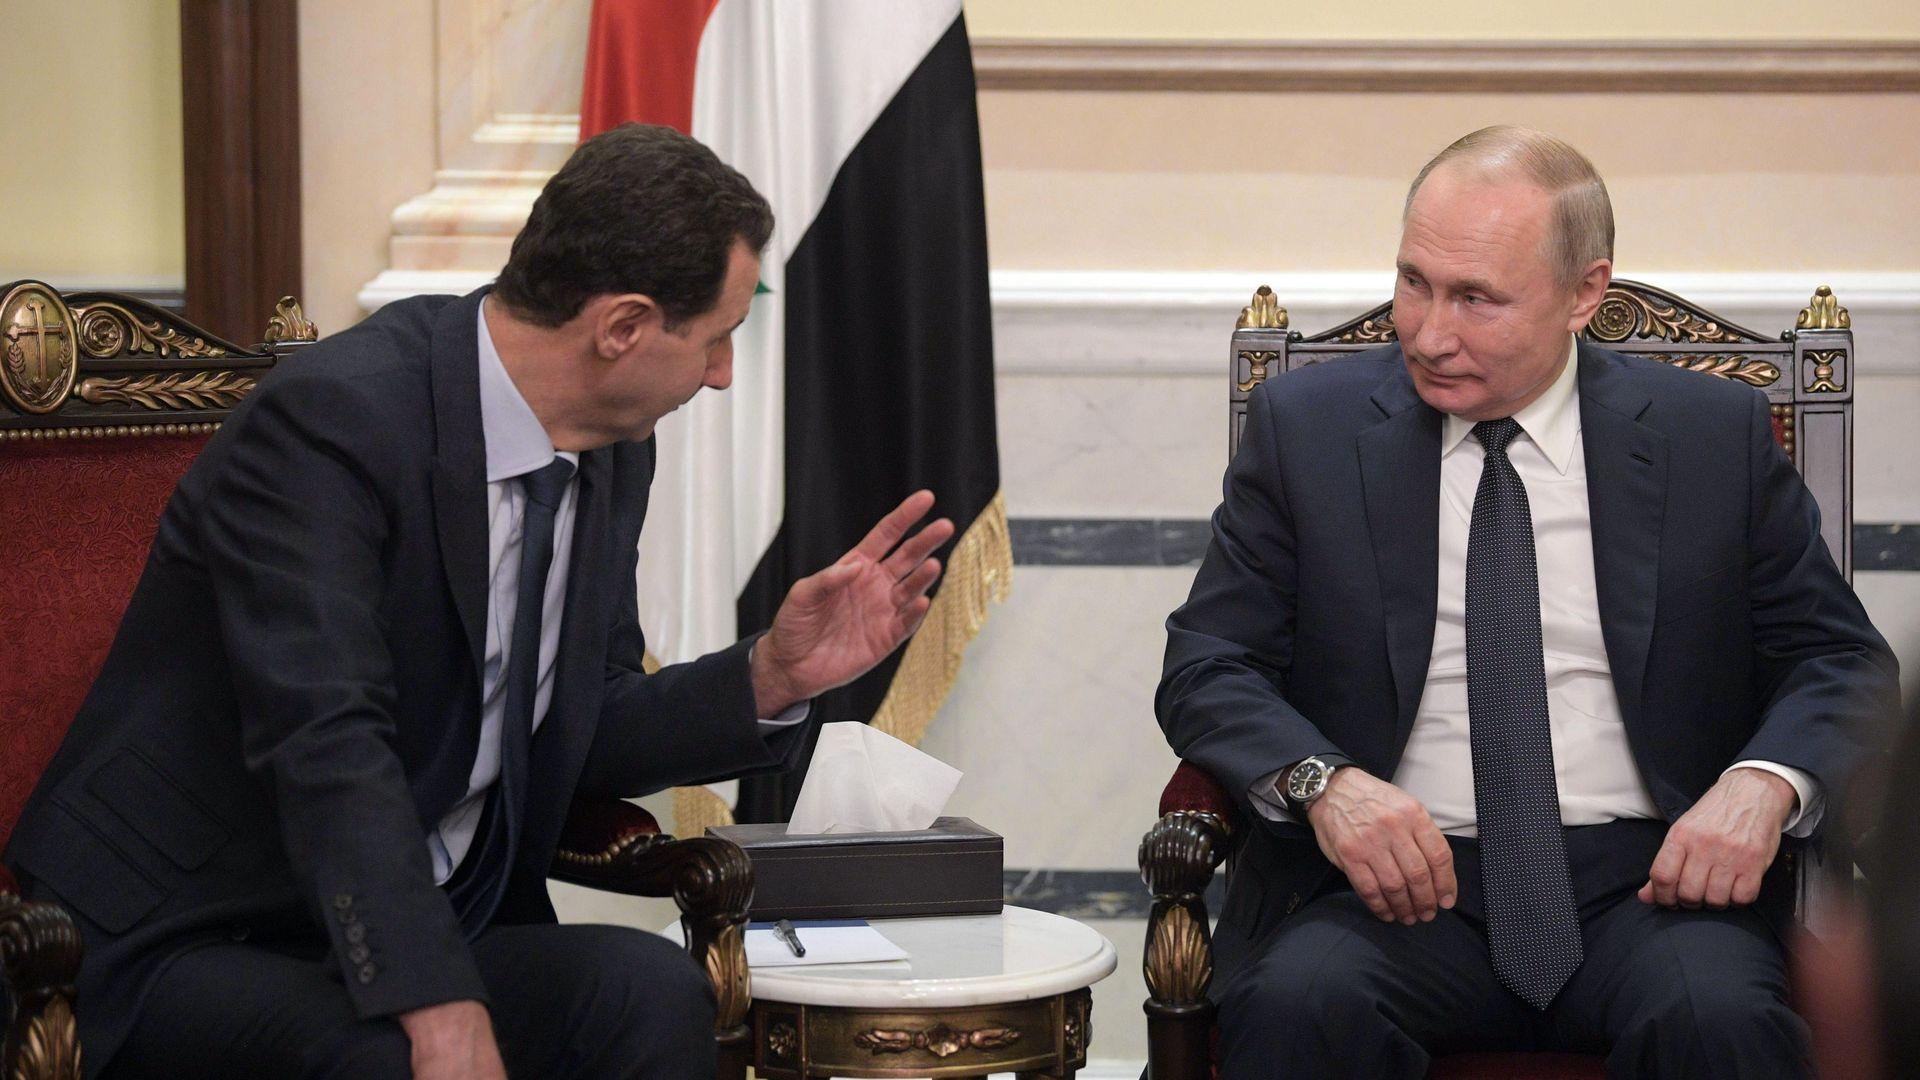 Putin tells Assad he should invite Trump to Damascus